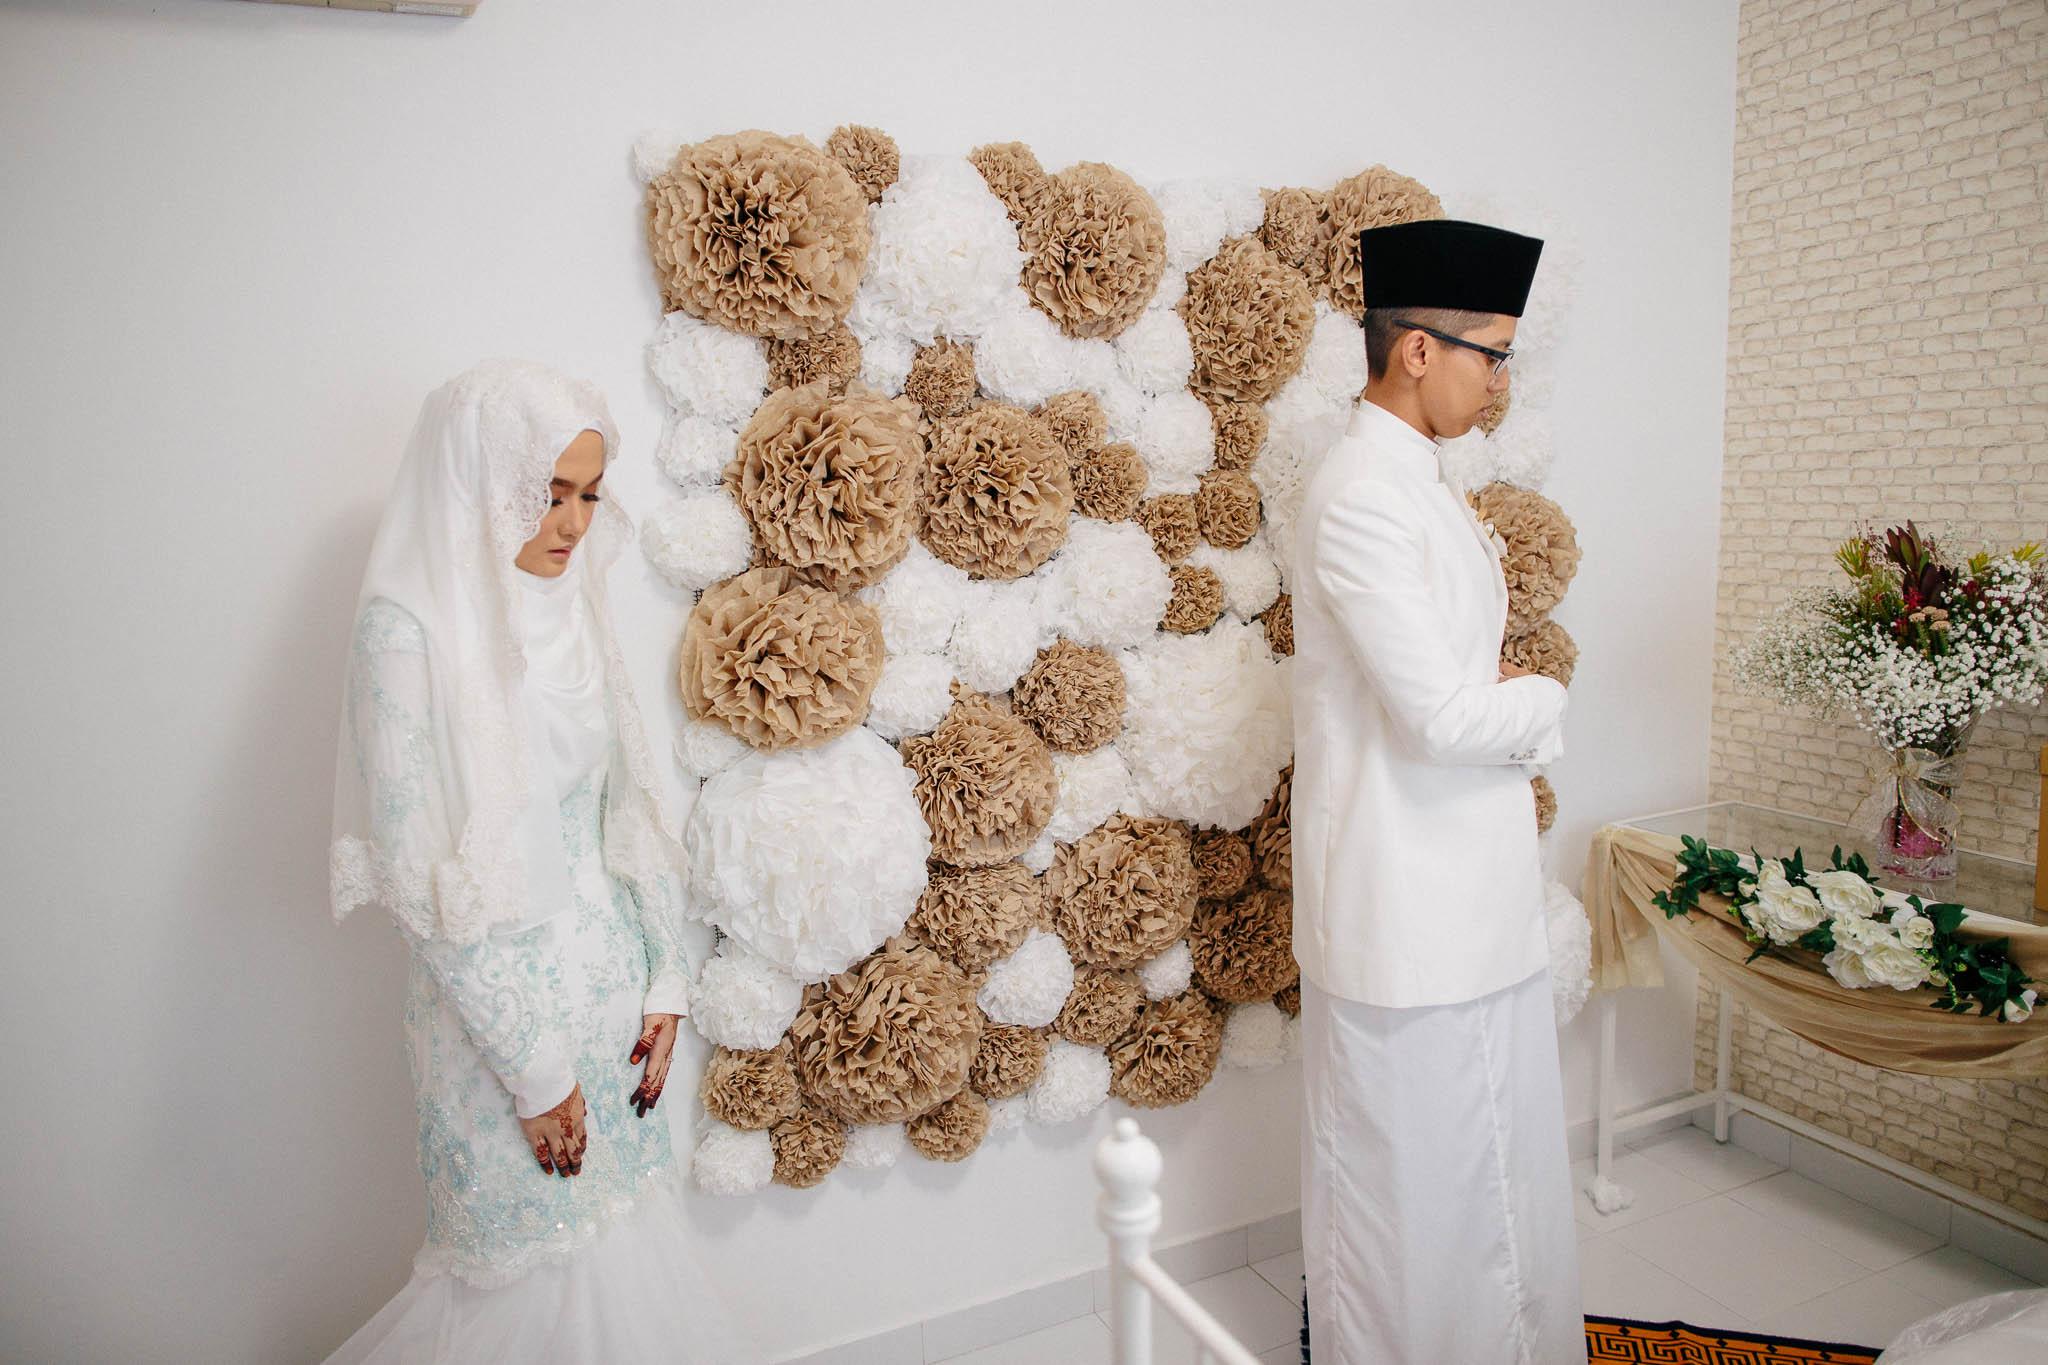 singapore-wedding-photographer-sharalyn-syazwan-020.jpg